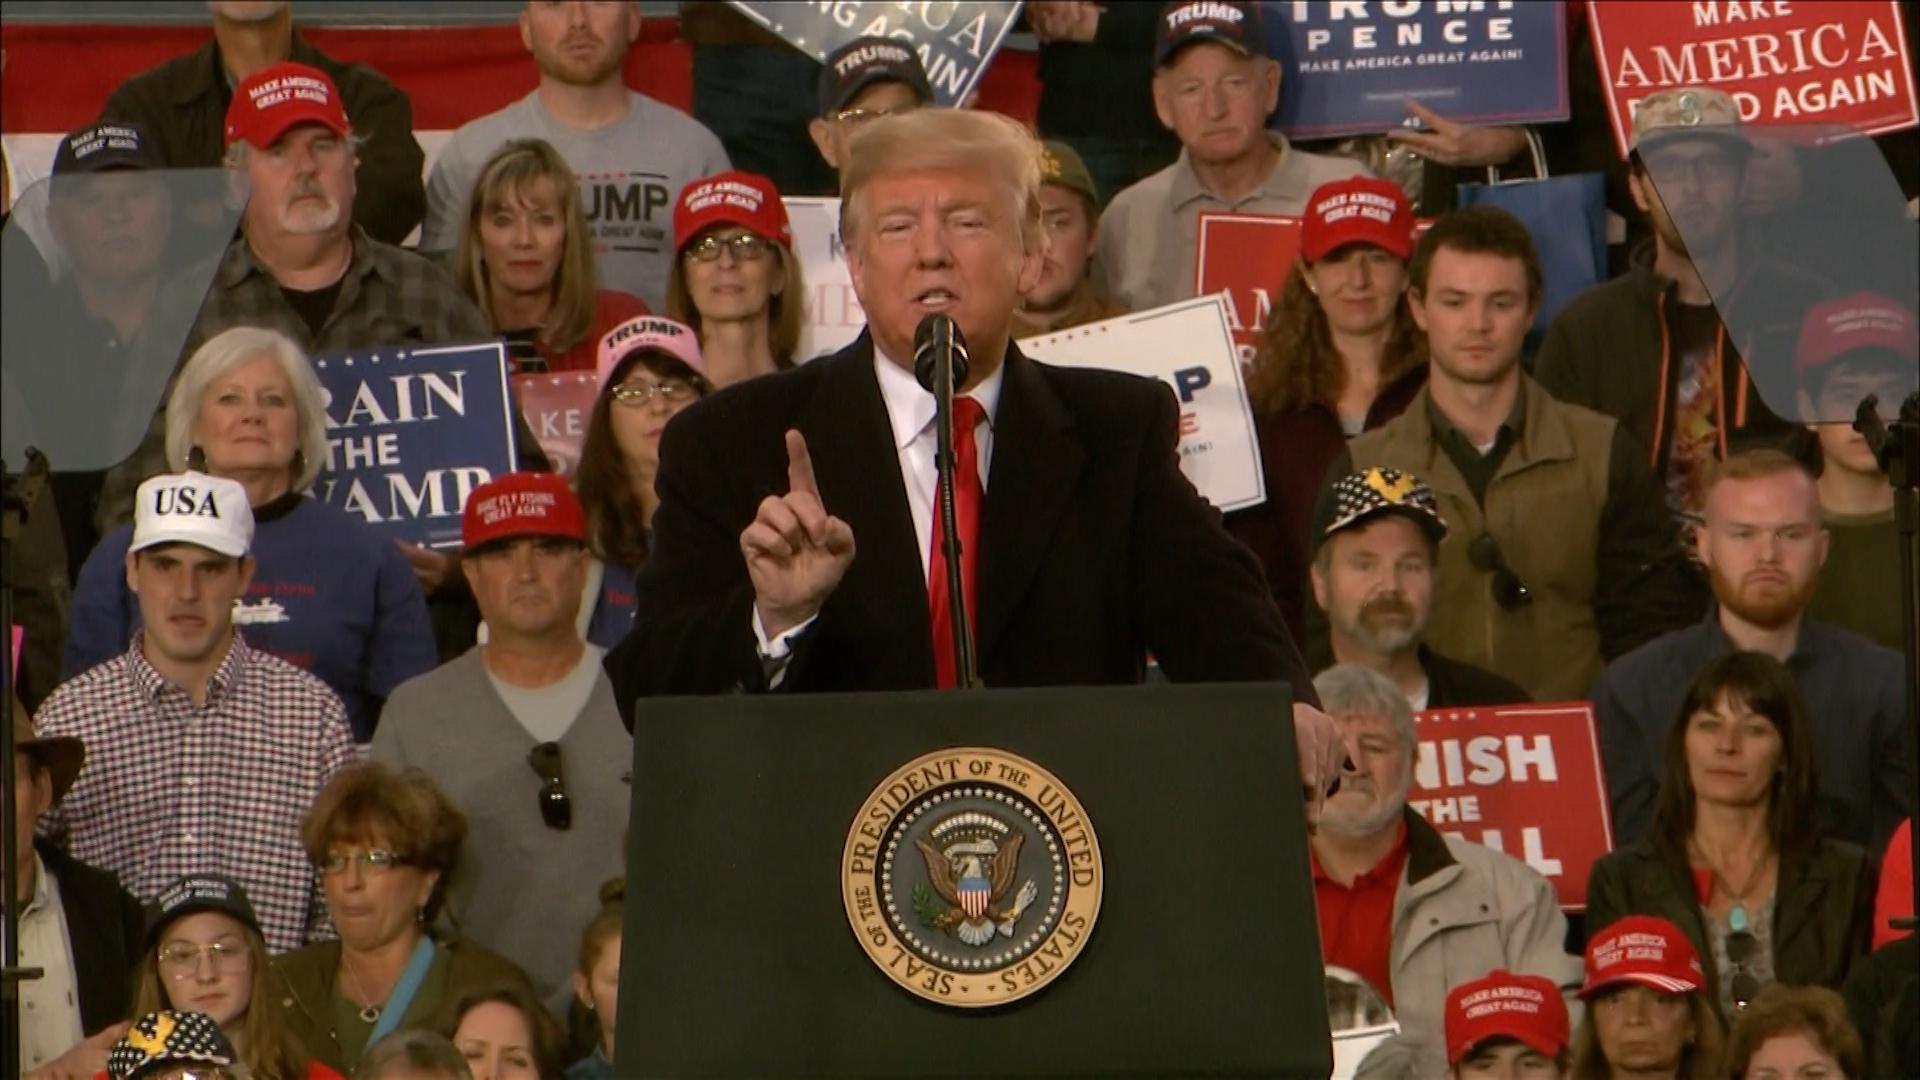 At Montana rally, Trump praises congressman for assaulting reporter